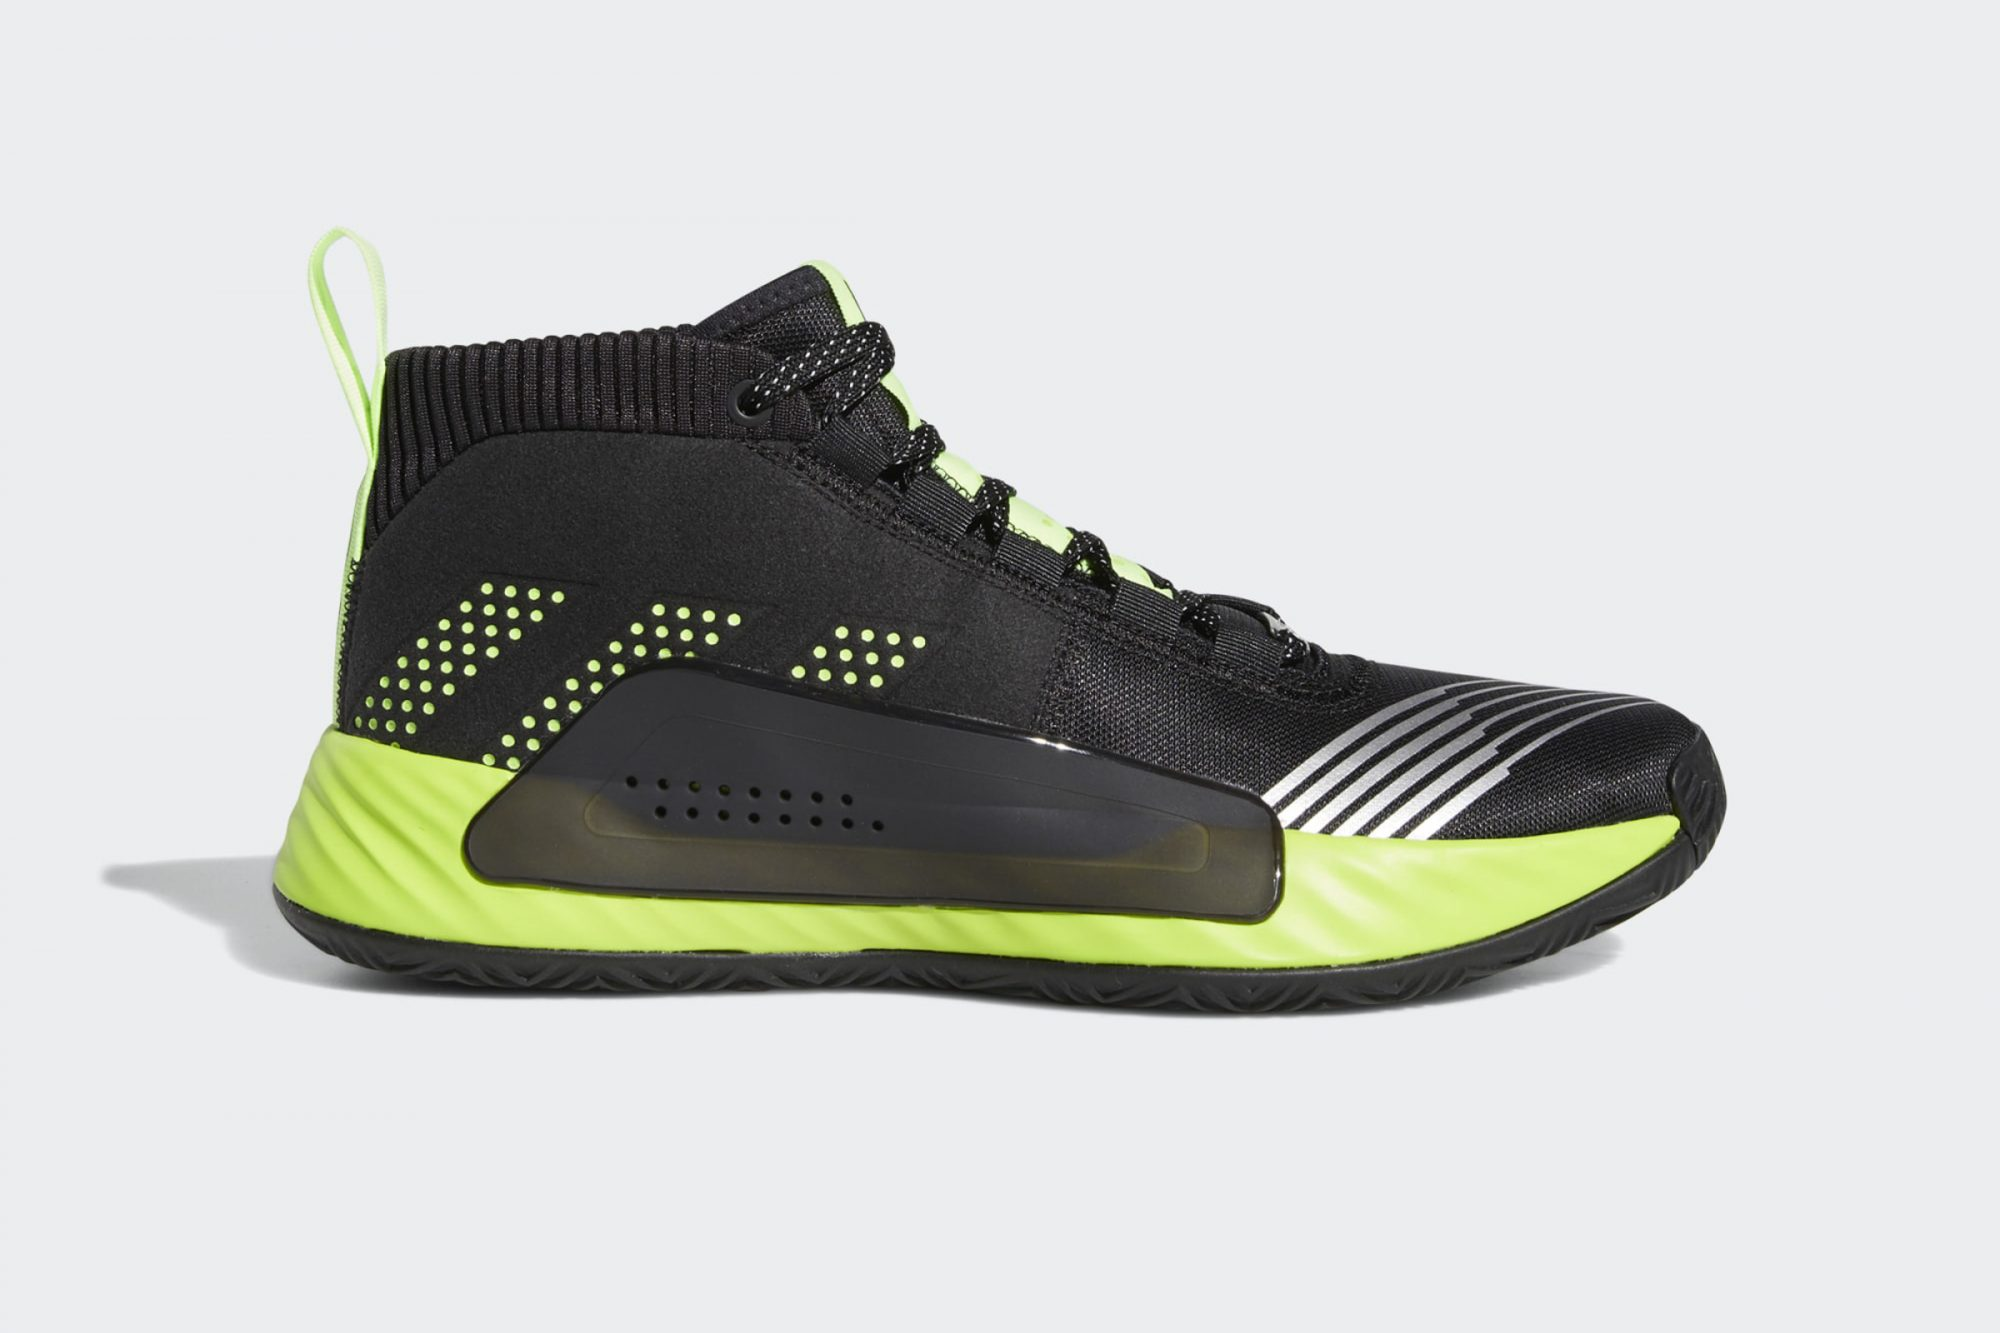 adidas Dame 5 Star Wars Lightsaber Green Shoes